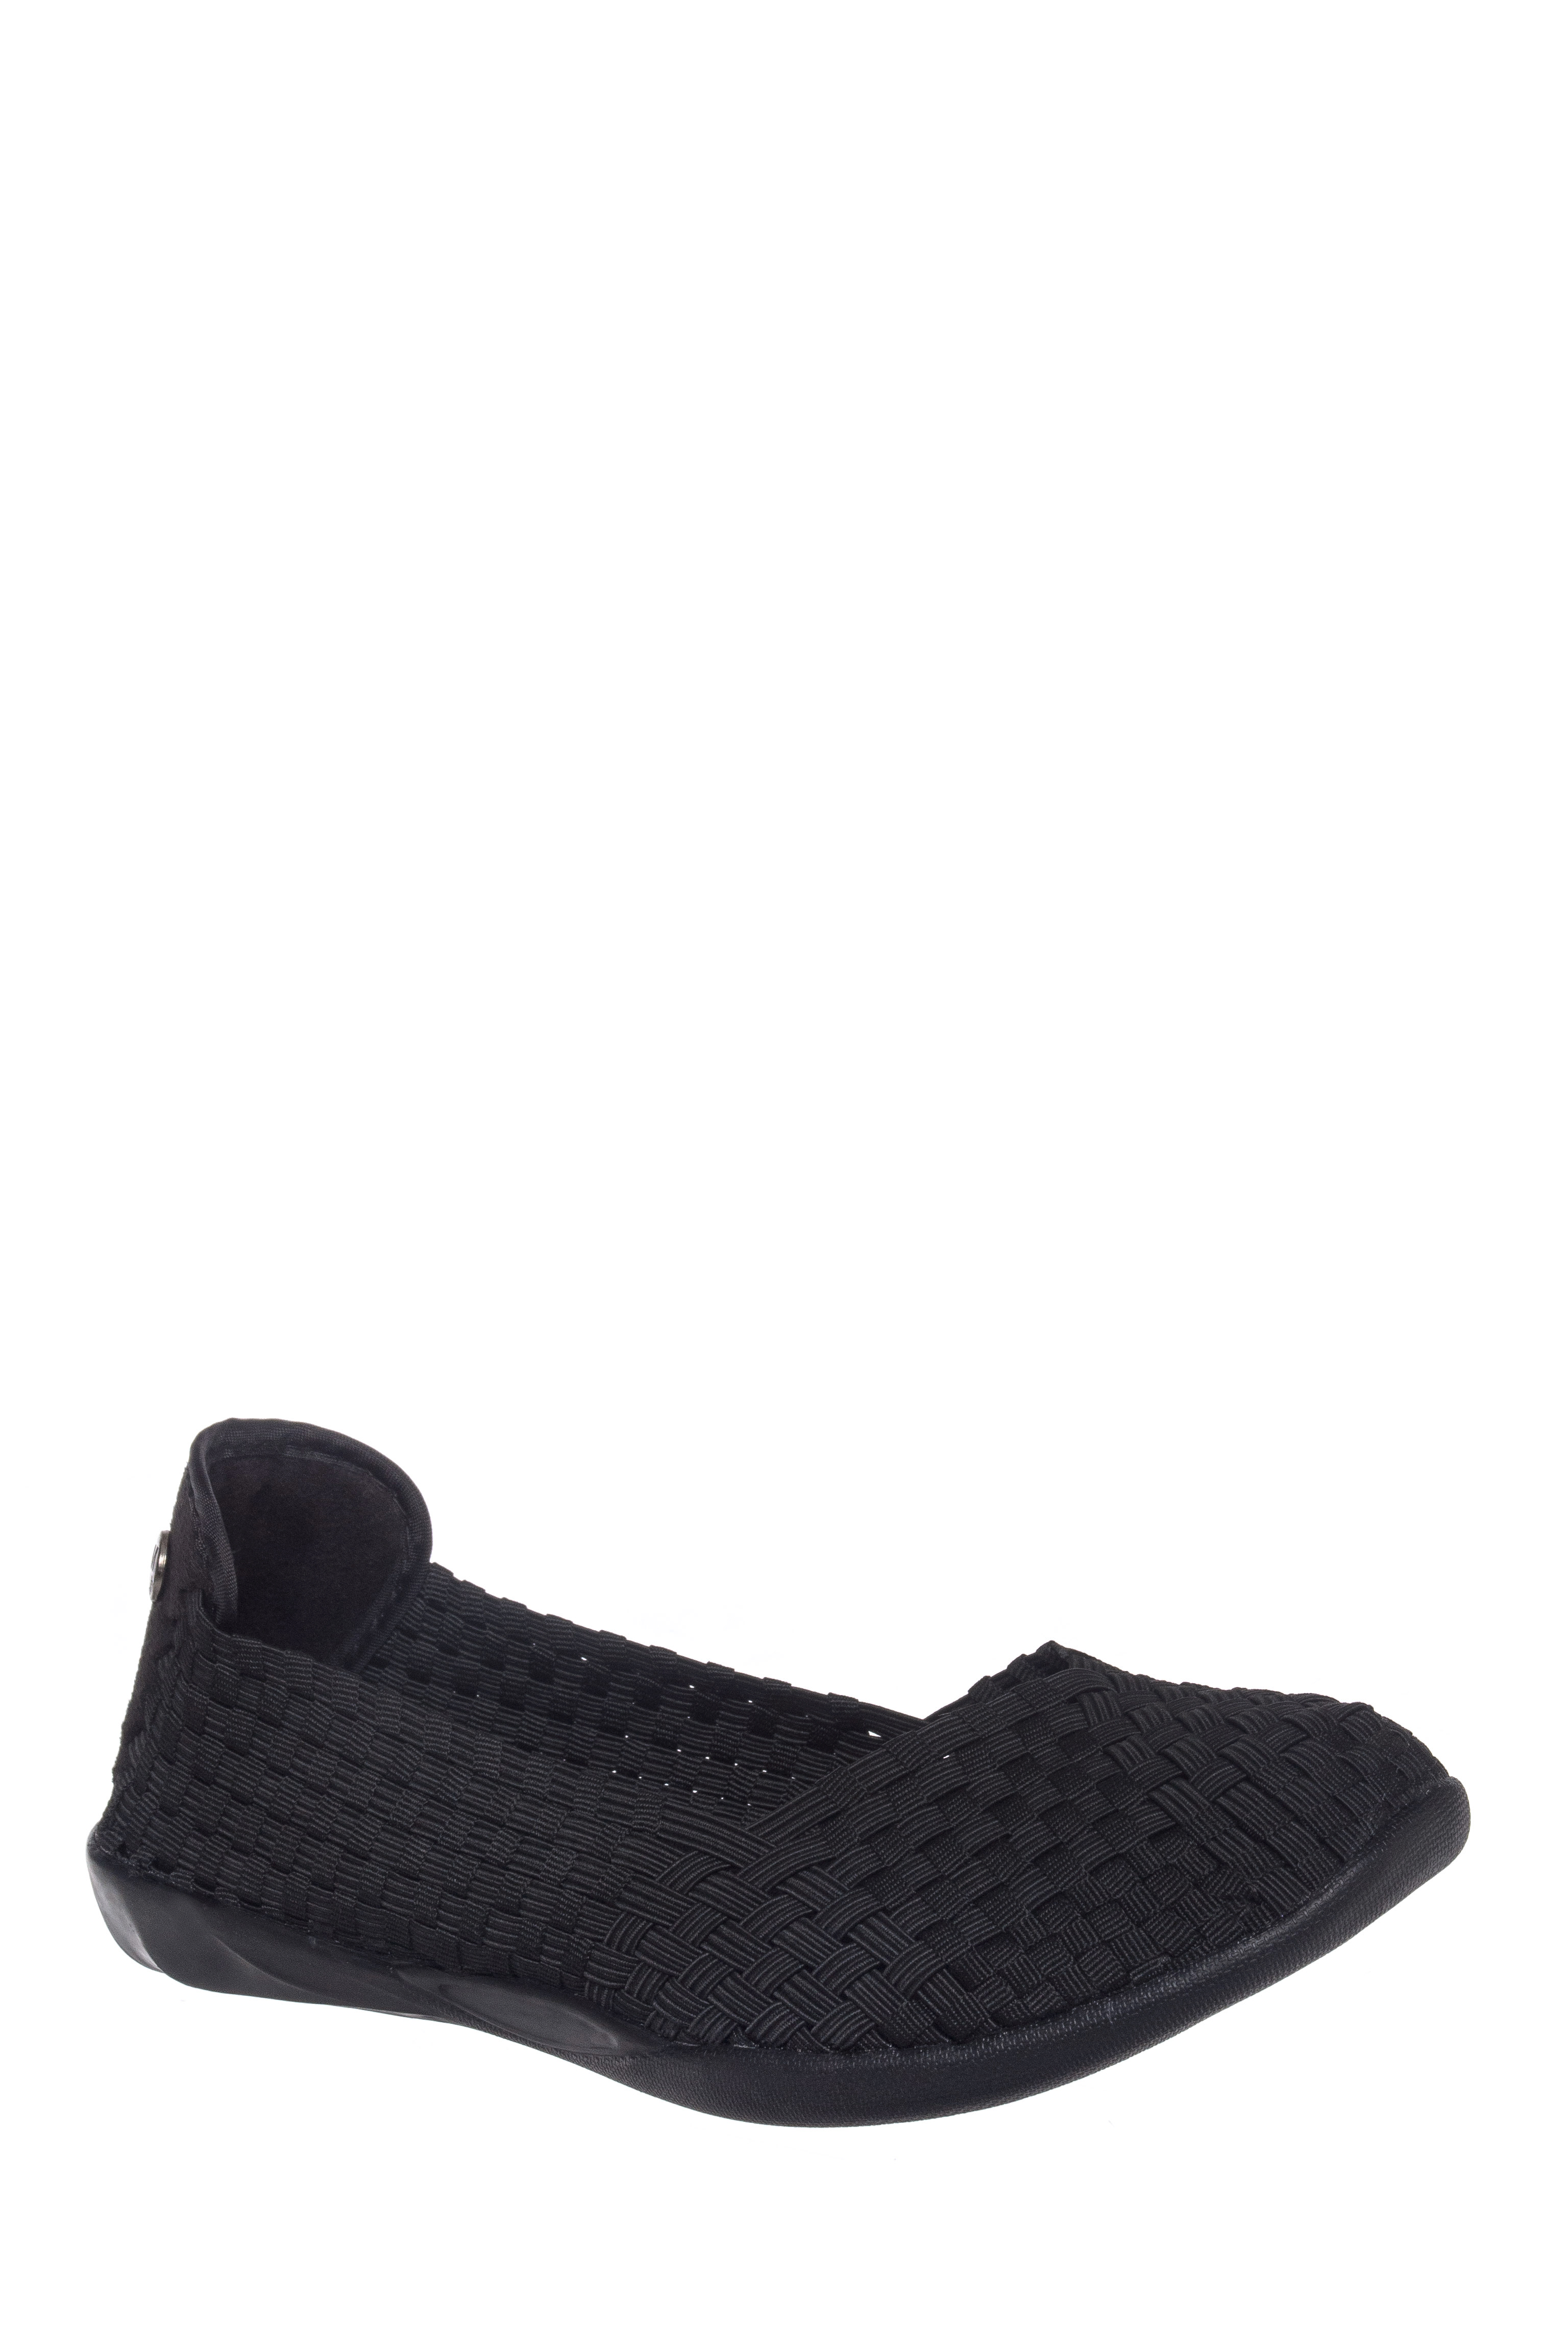 Bernie Mev Catwalk Comfort Flats - Black